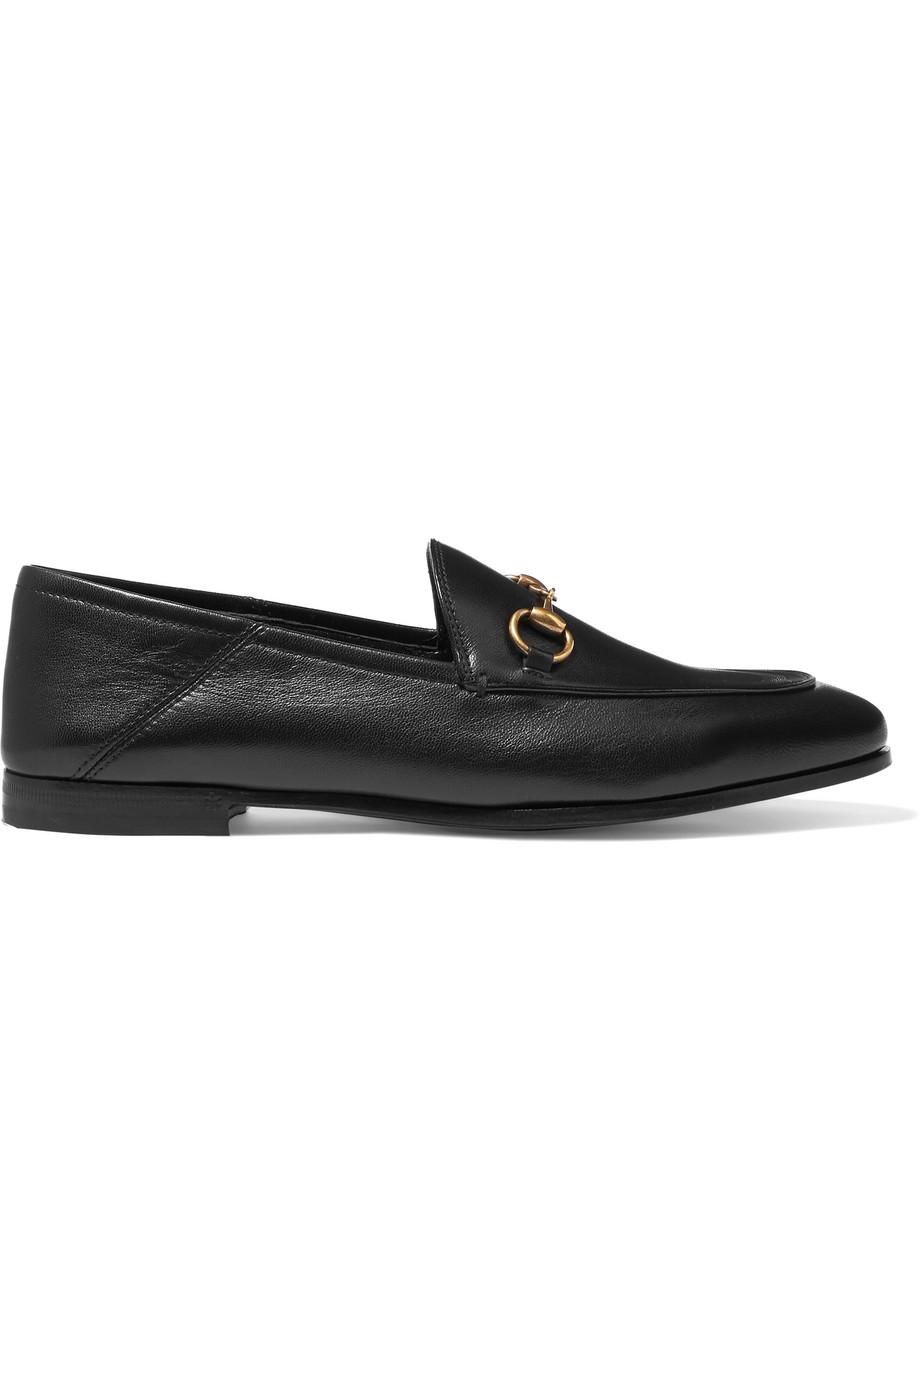 e7c31d1c87e Don t get me wrong - I do love a heel